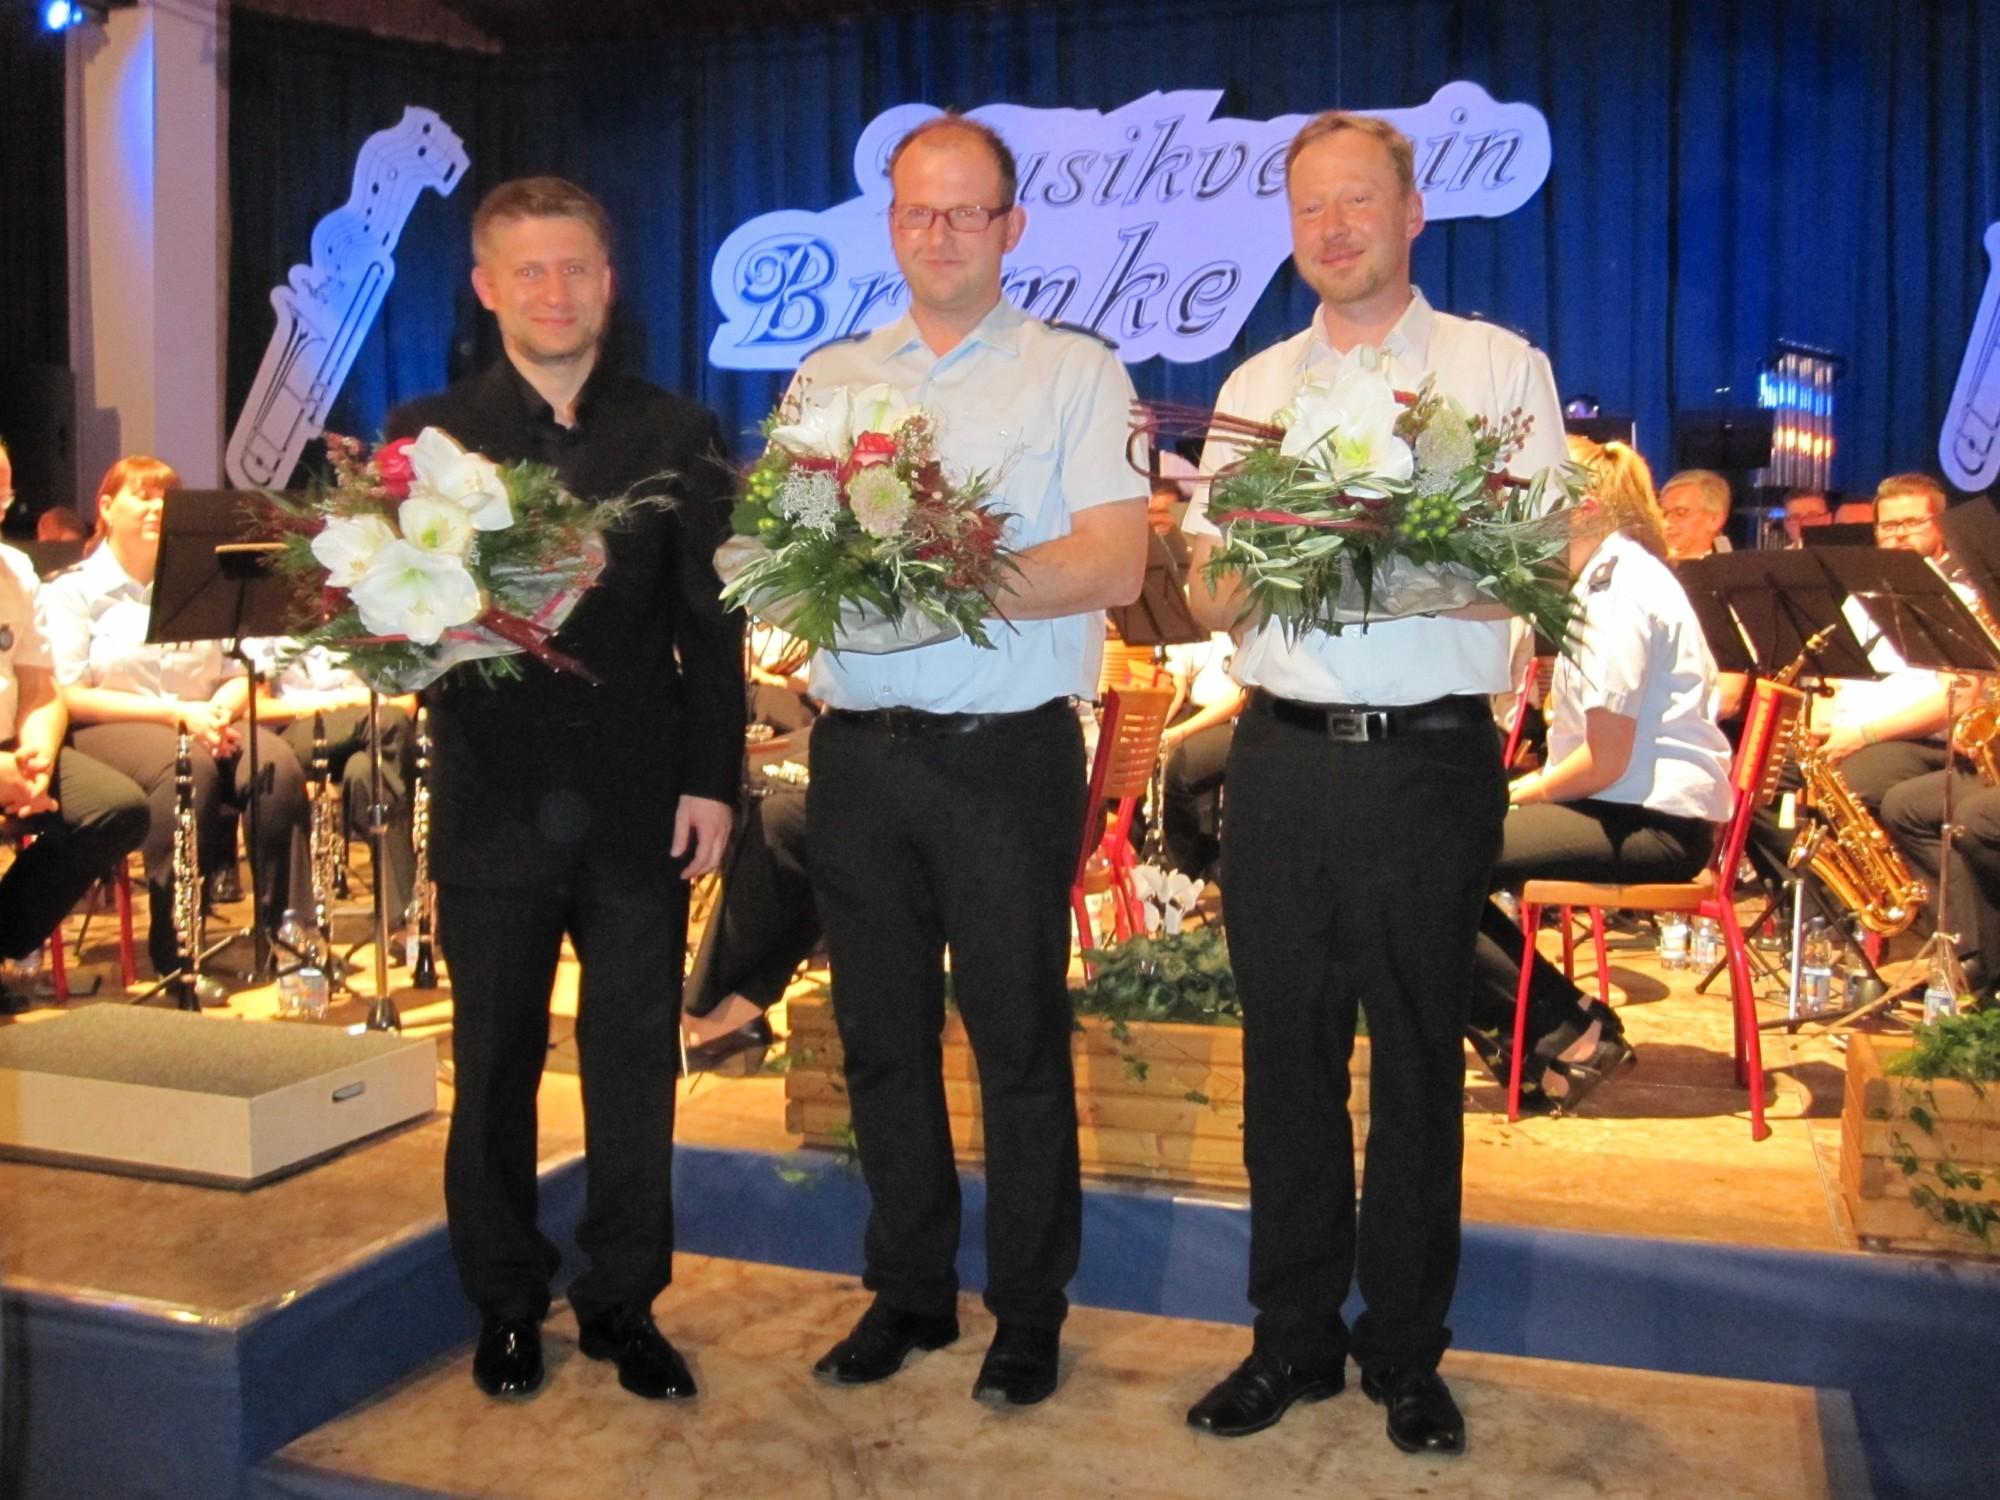 Dirigenten v.l.n.r.: Mathias Pfläging, Markus Brüggemann (Heggen), Uwe Becker (Bremke).